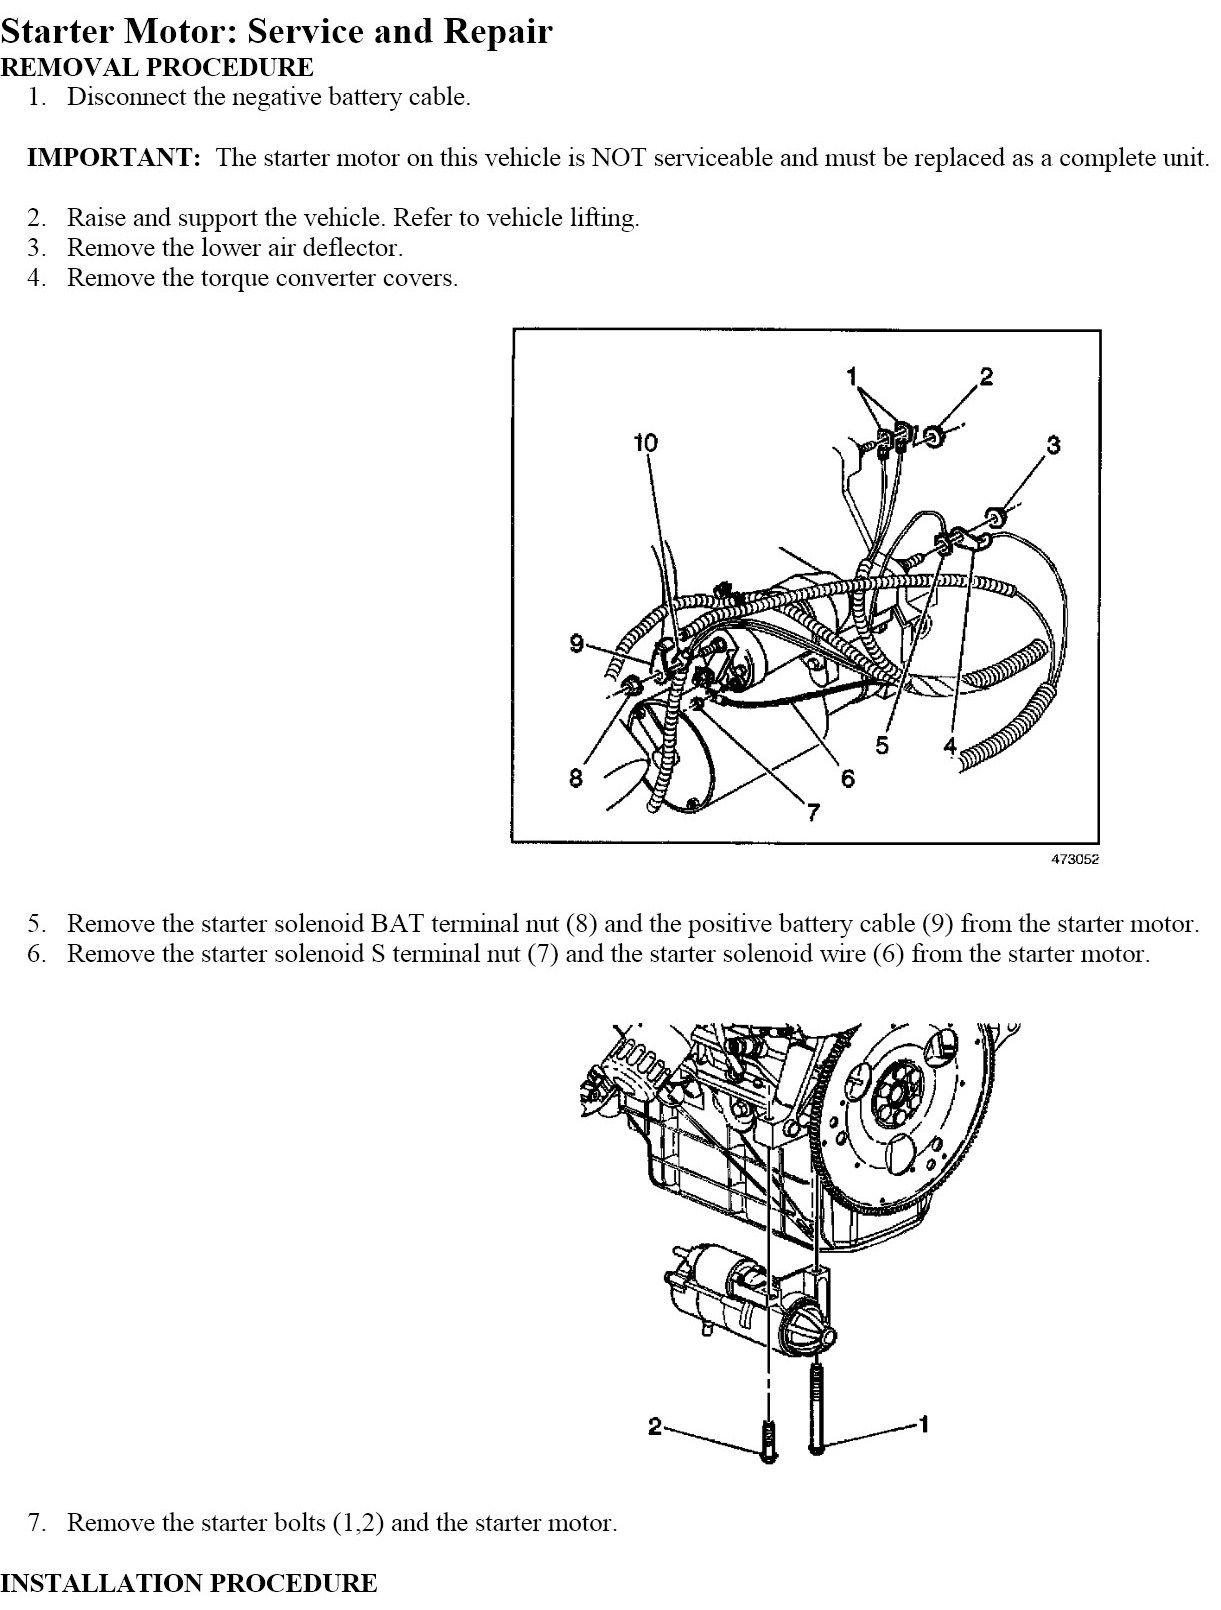 44 Best Of 2004 Chevy Impala Starter Wiring Diagram in